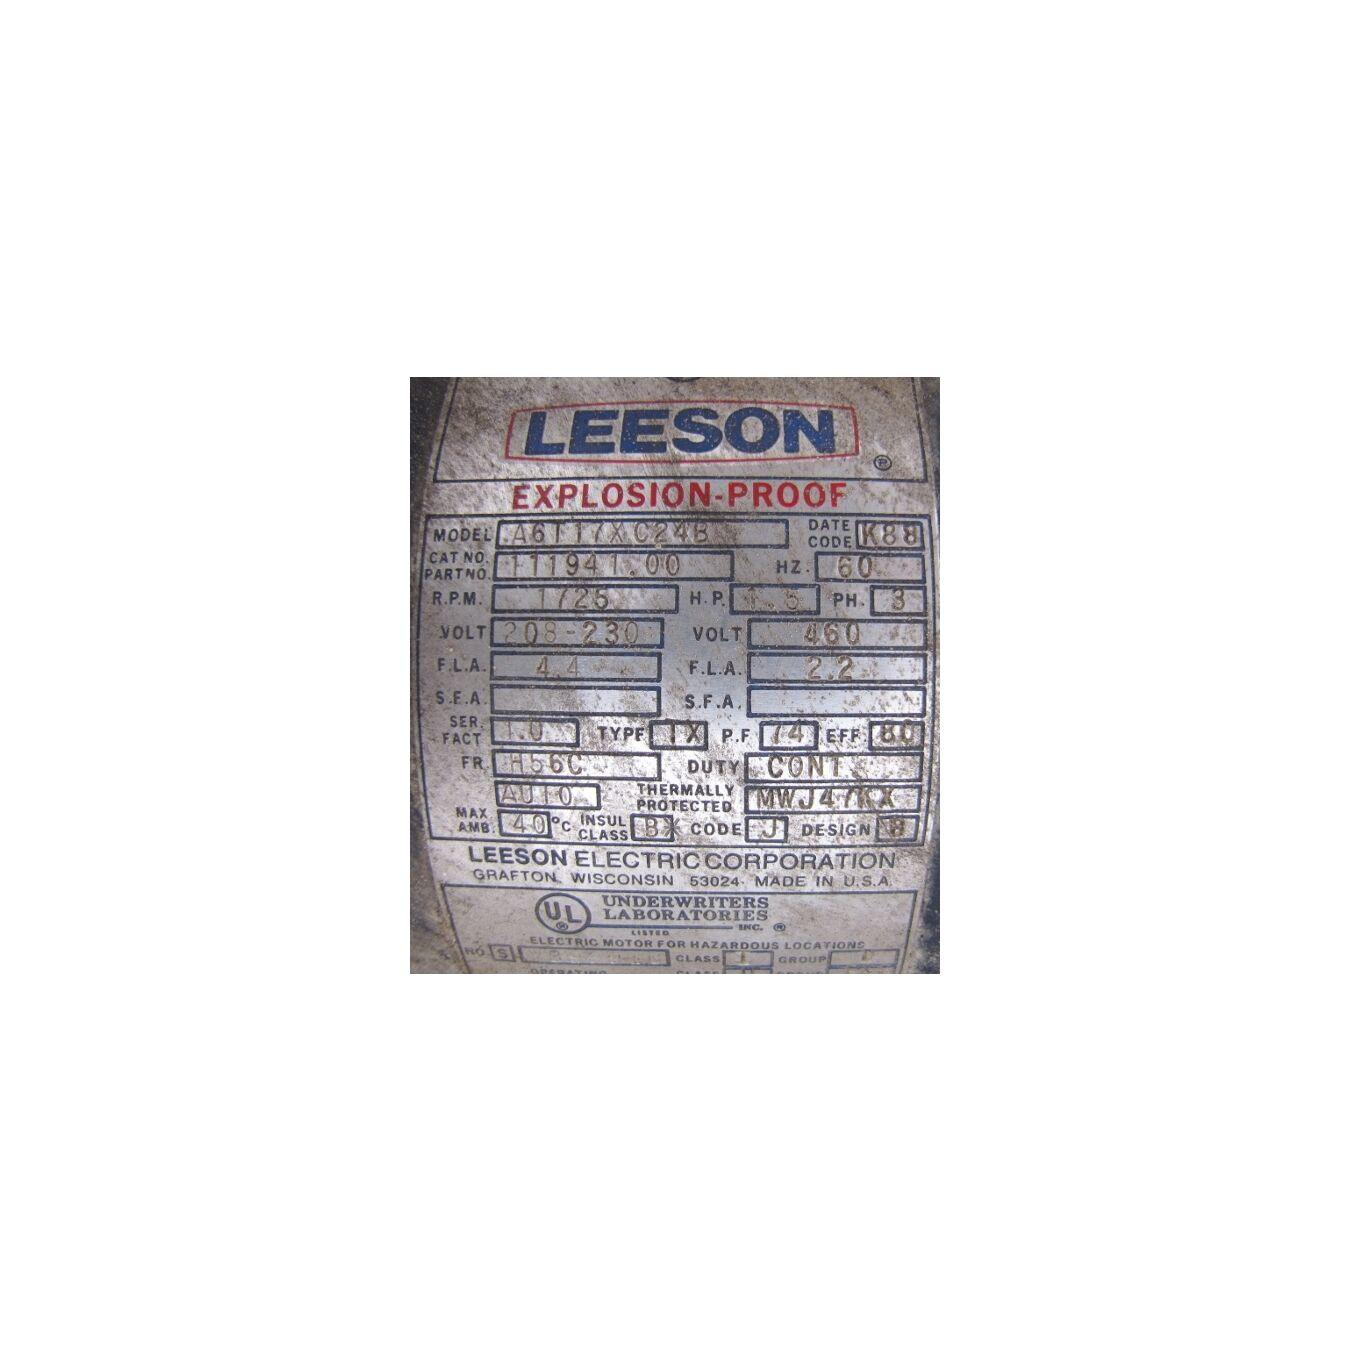 Used bliss rotary feeder magnet valves for Leeson explosion proof motor